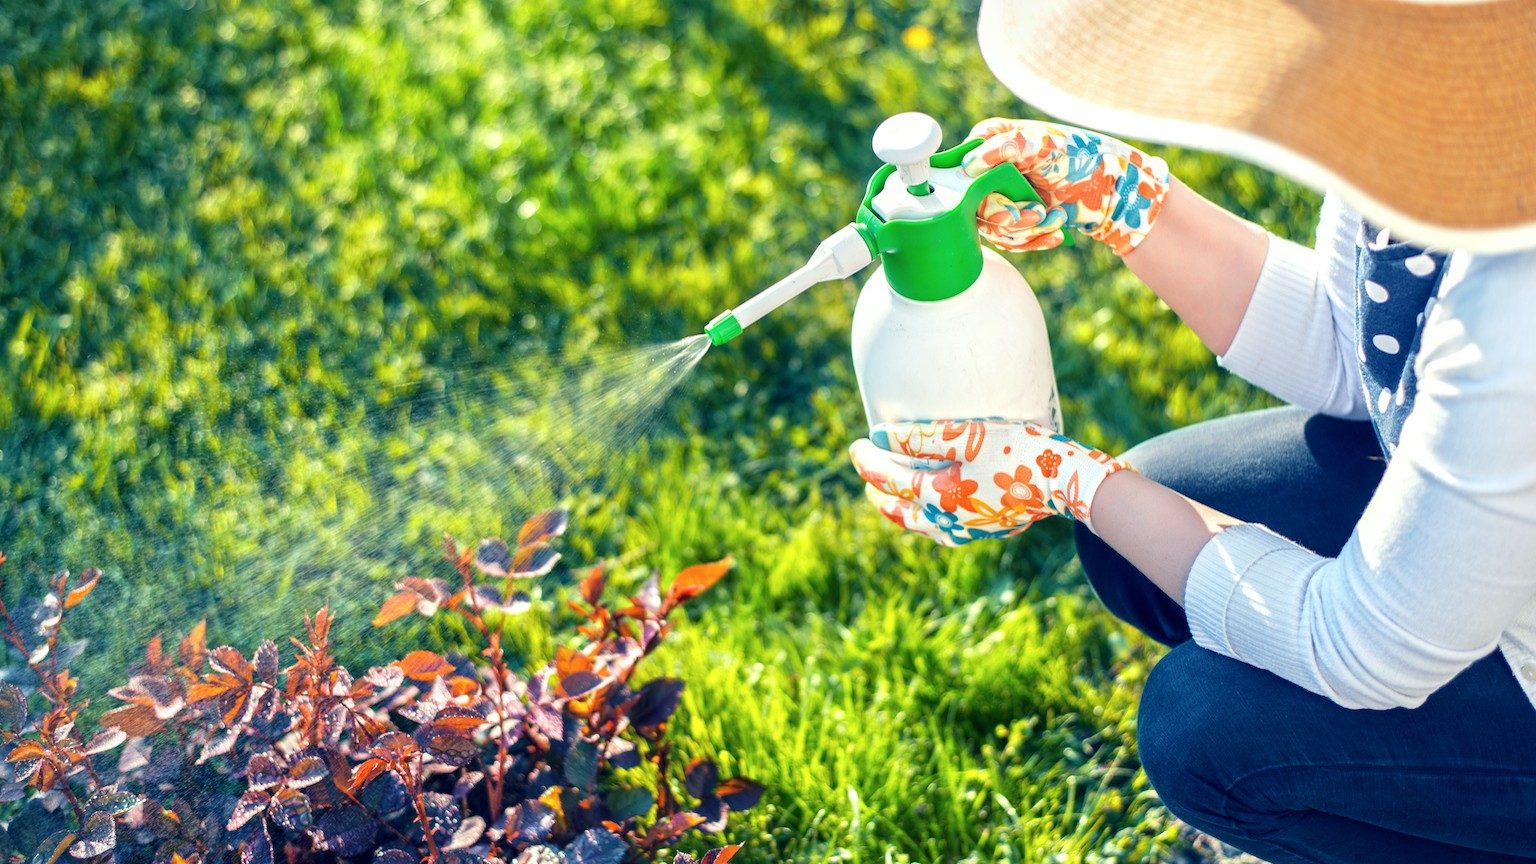 Woman spraying plants using water pulverizer